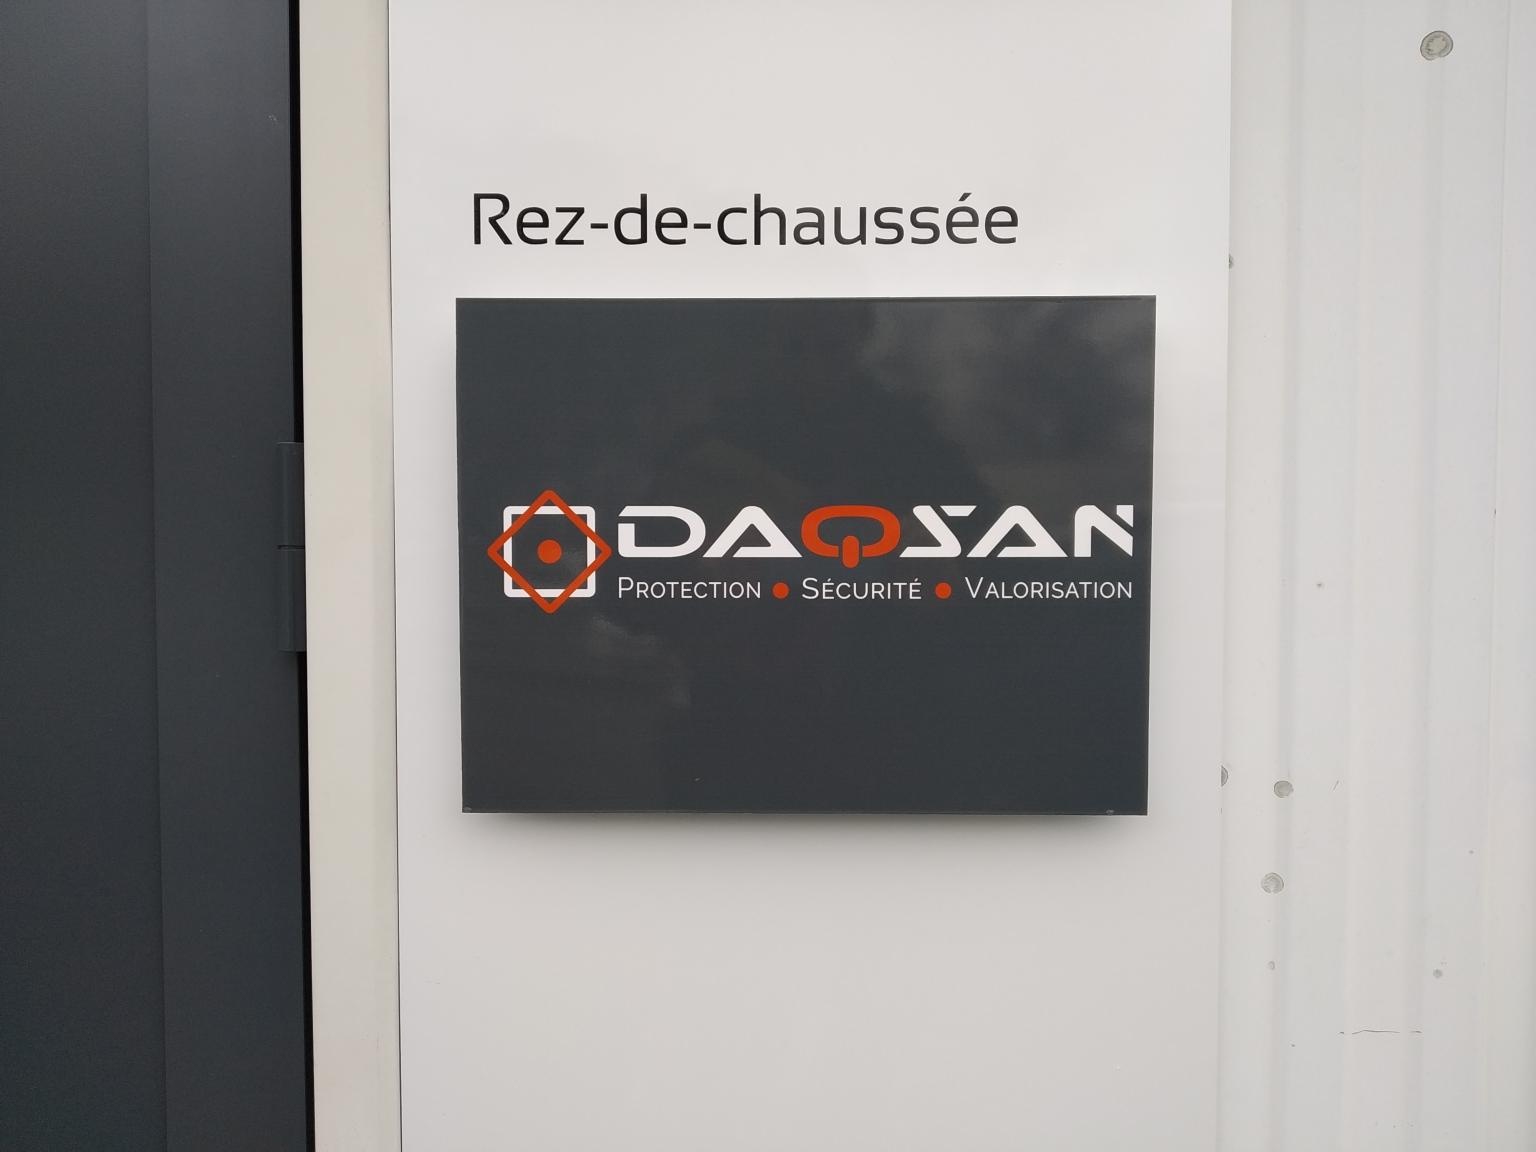 presentation-entreprise-logo-image.jpg